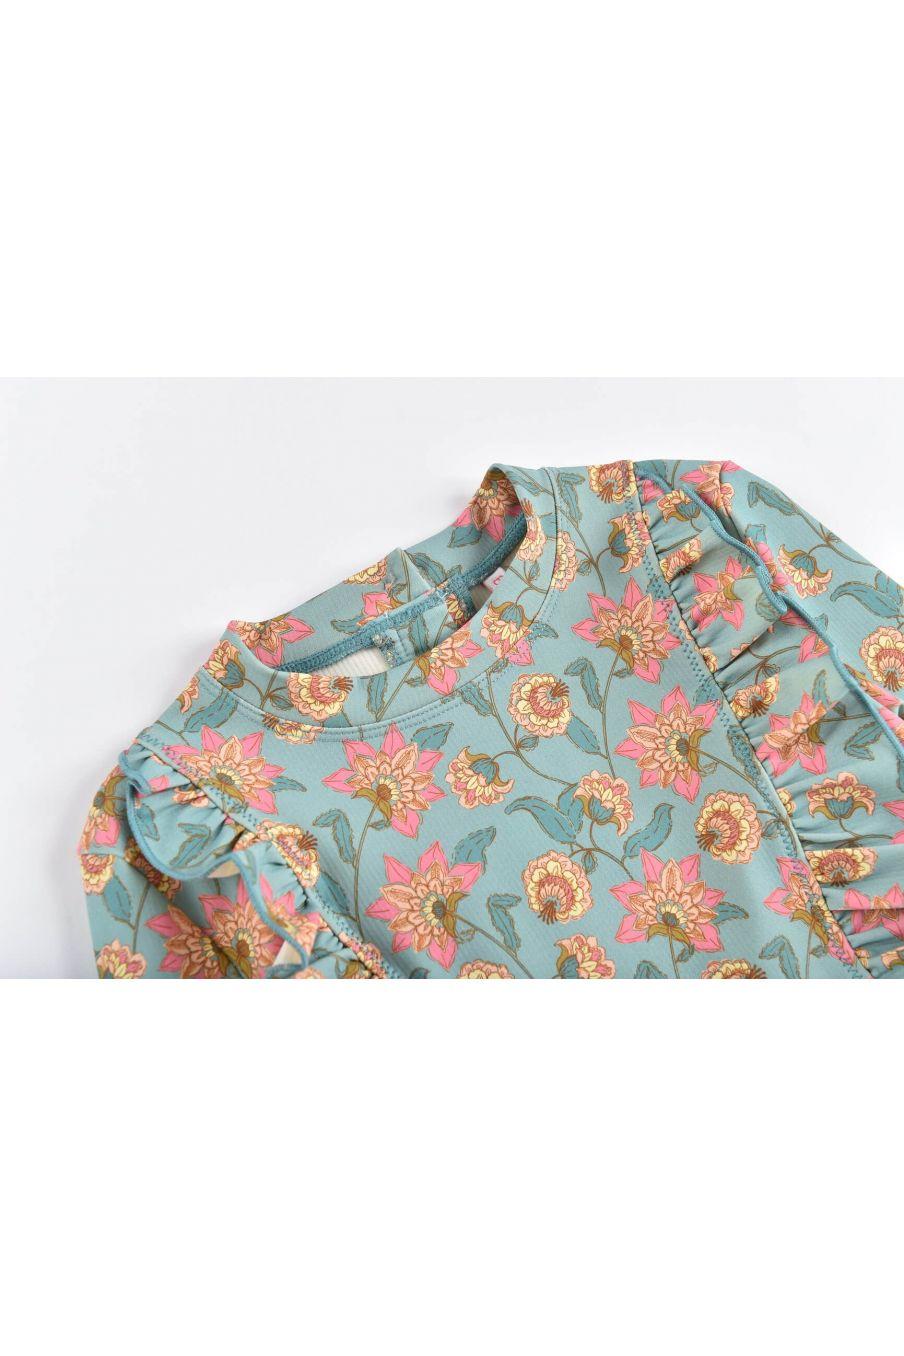 boheme chic vintage set de protection uv fille toluca turquoise flowers